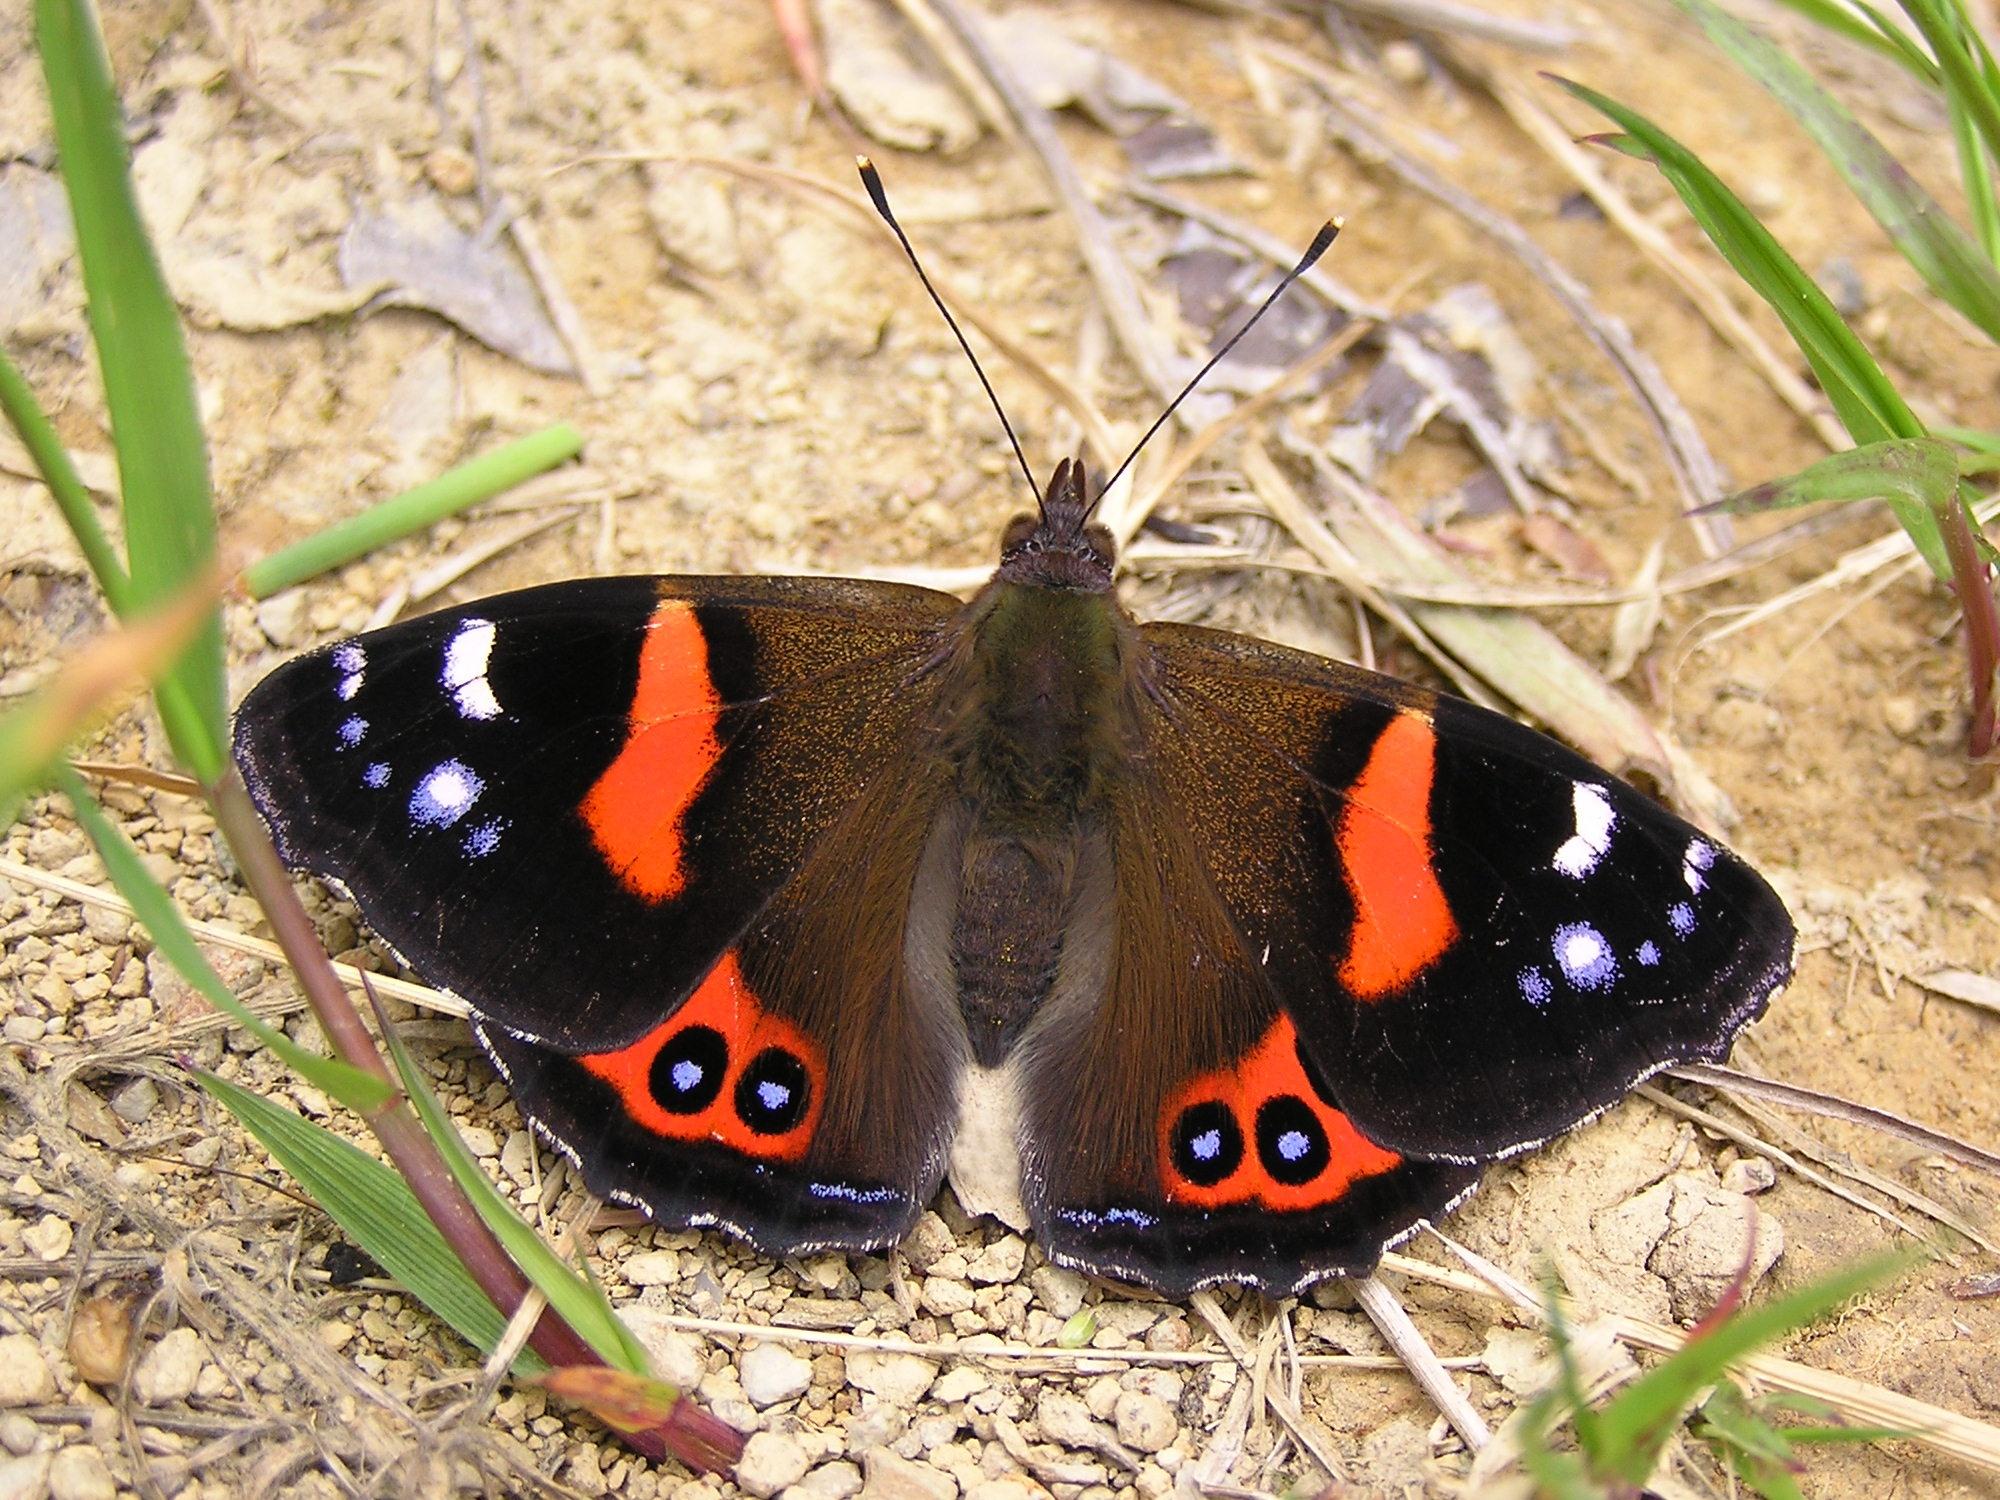 Bộ sưu tập cánh vẩy 6 - Page 11 NZ_Red_Admiral_Butterfly_%28Vanessa_gonerilla%29